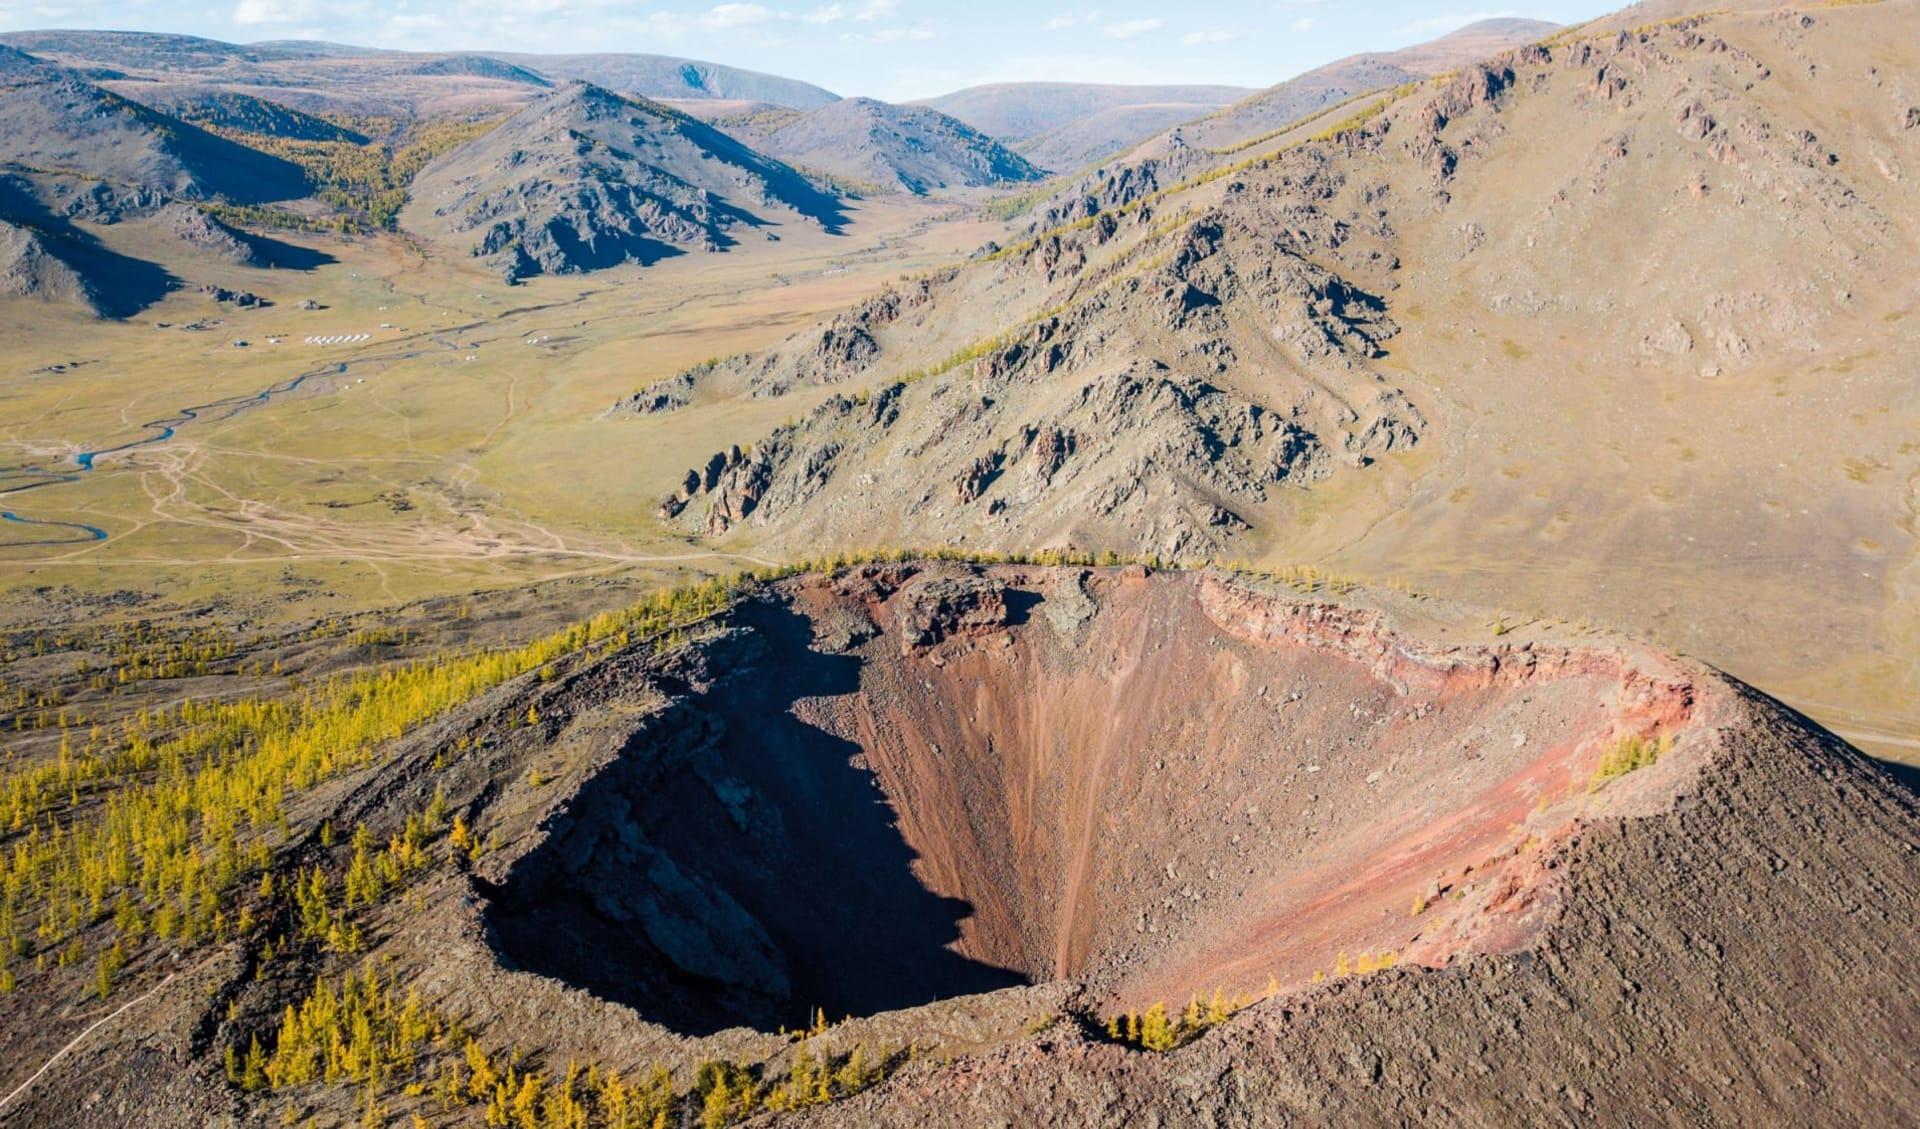 Grasland, Steppenwind und Wüstensand ab Ulaanbaatar: MN_Vulkan Khorgo_shutterstock_1212155158_Daniel Karfik